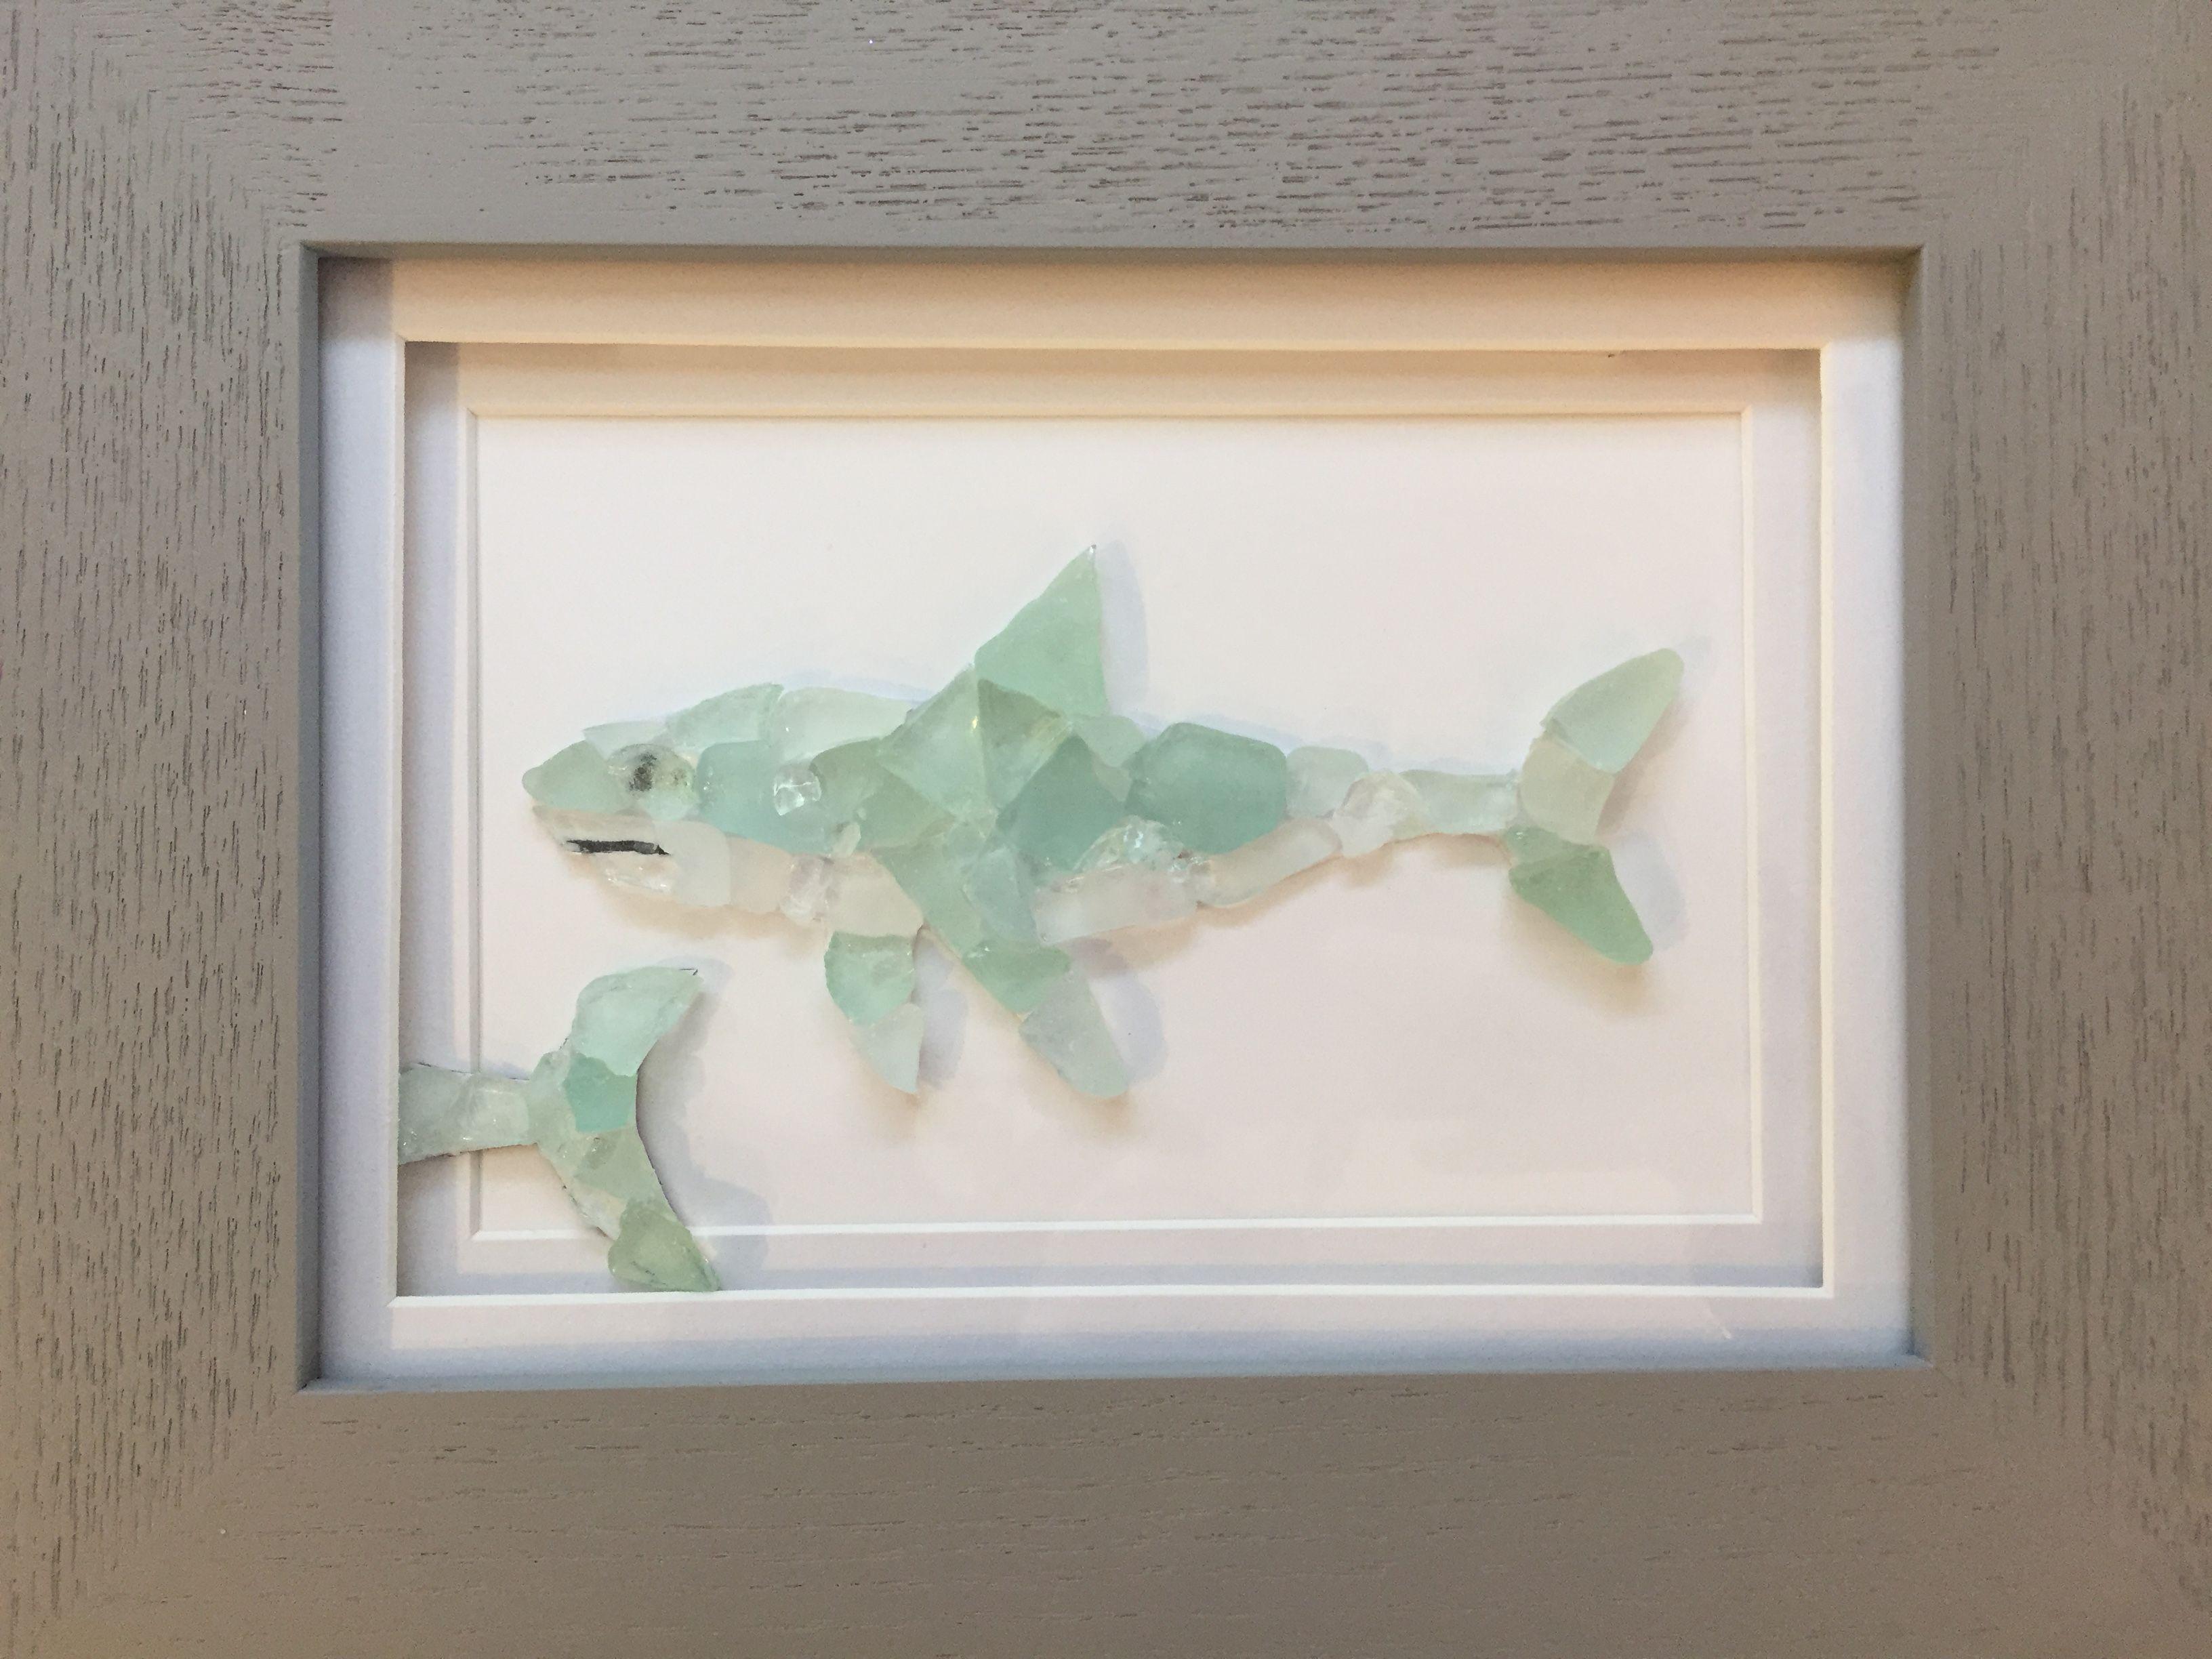 Shark made with natural sea glass. Framed wall art | Wall art ...